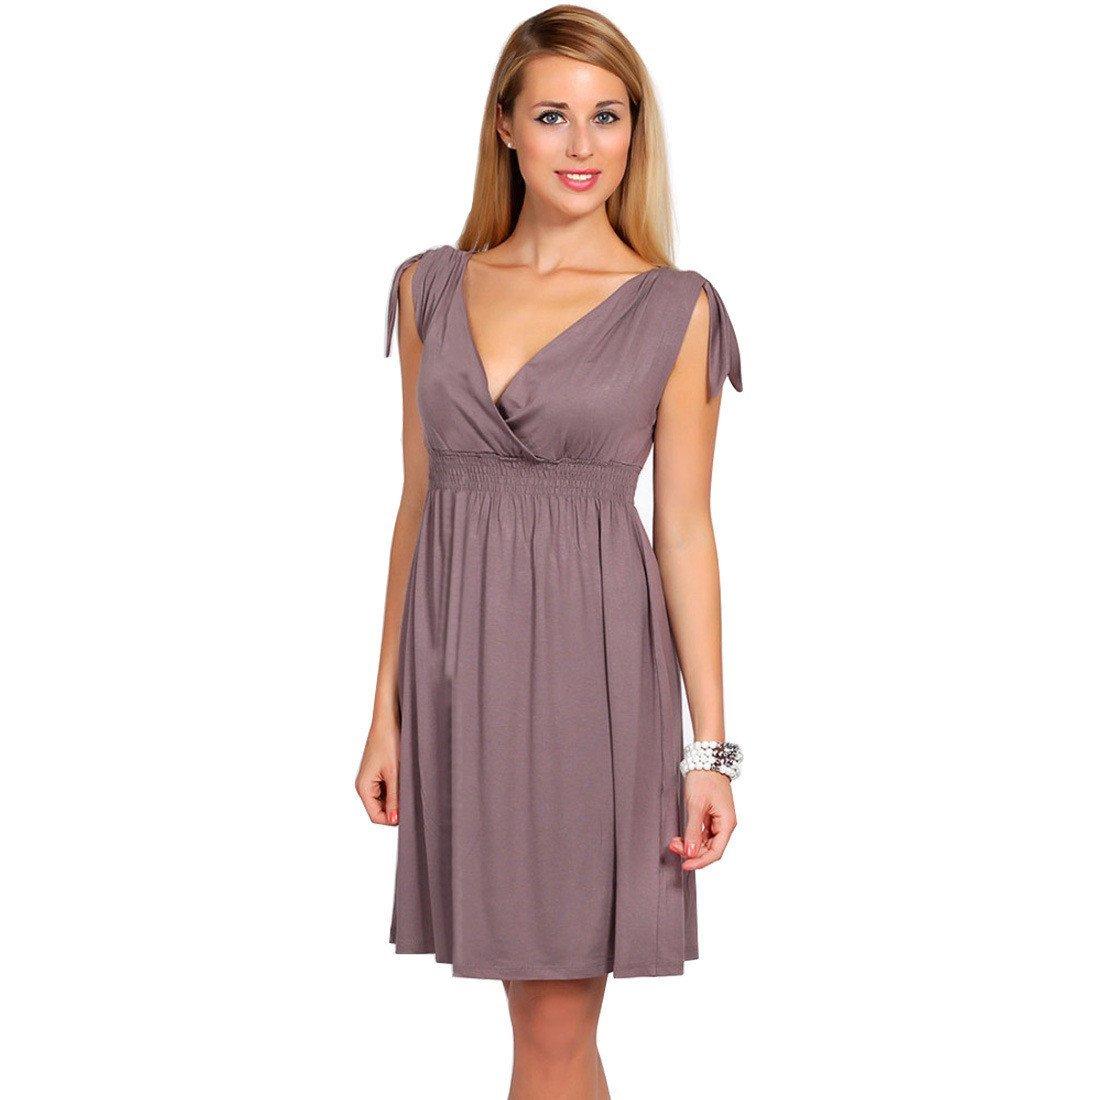 iHAIPI - Damen Kurzärmel Sommerkleid V-Ausschnitt Business Faltenrock Cocktailkleid retro 50er Jahre Kleid (02. Medium, 08. Braun)